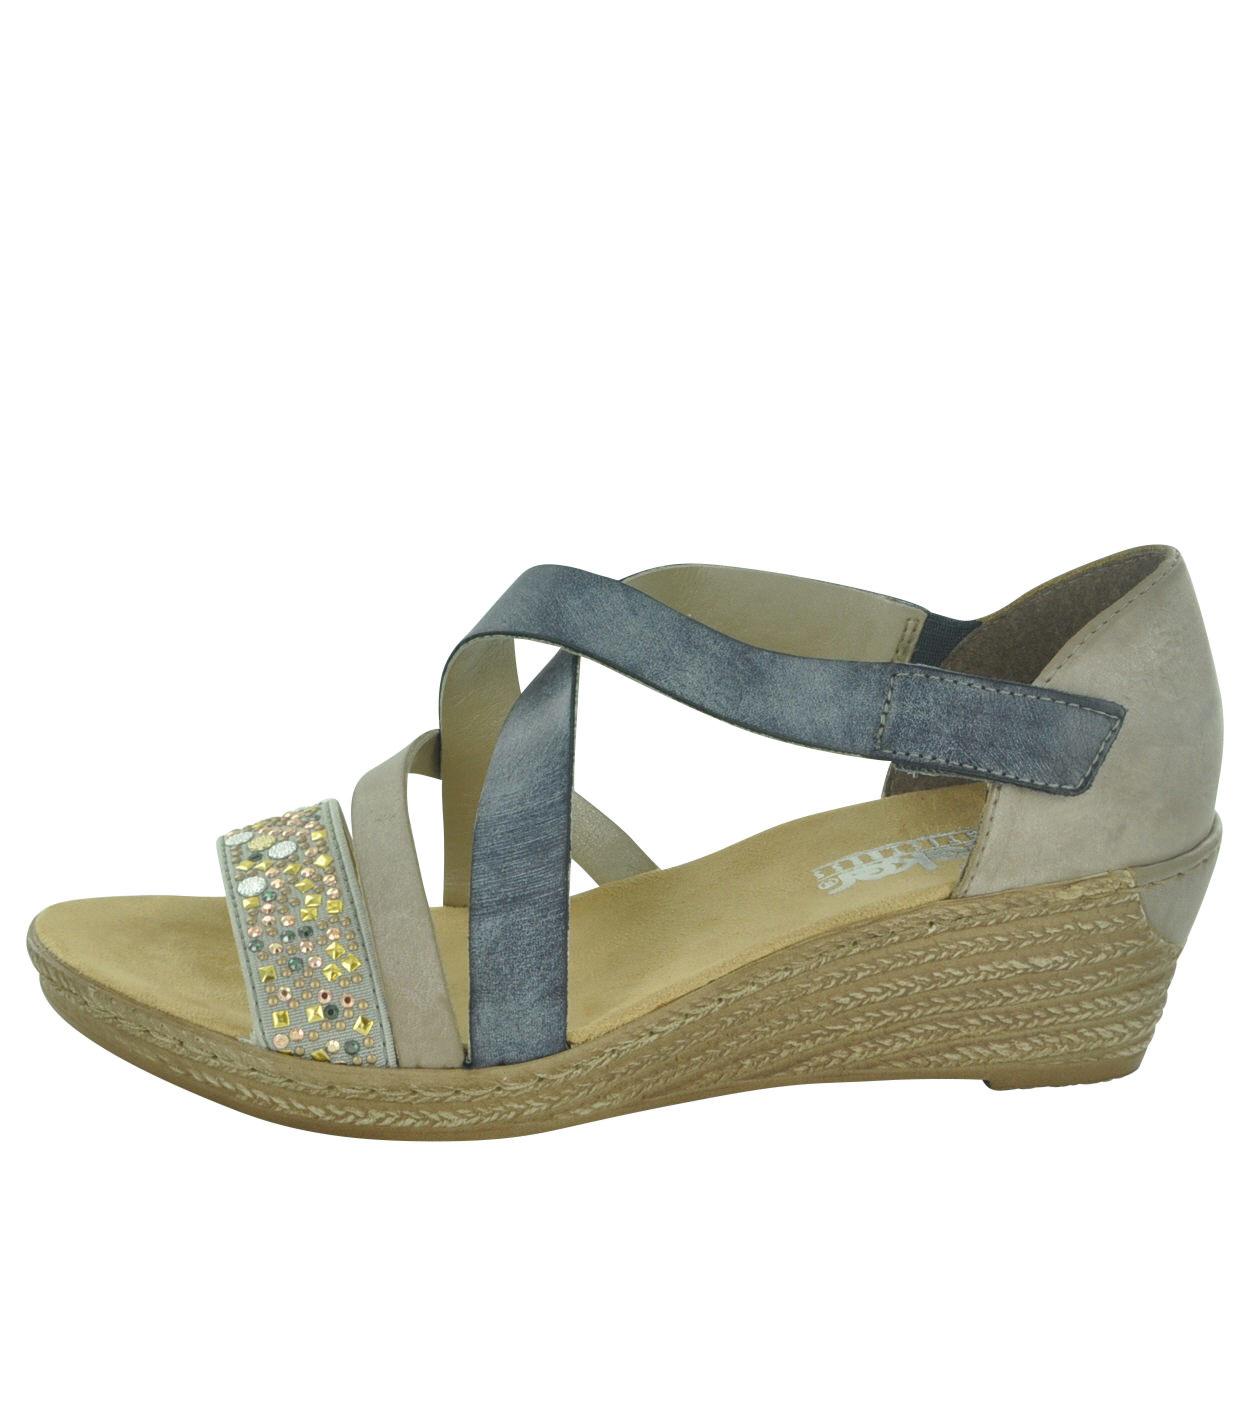 12c51692eade3 Rieker 62405 Women's Wedge Sandals | Rieker Shoes Ireland - Shoe ...